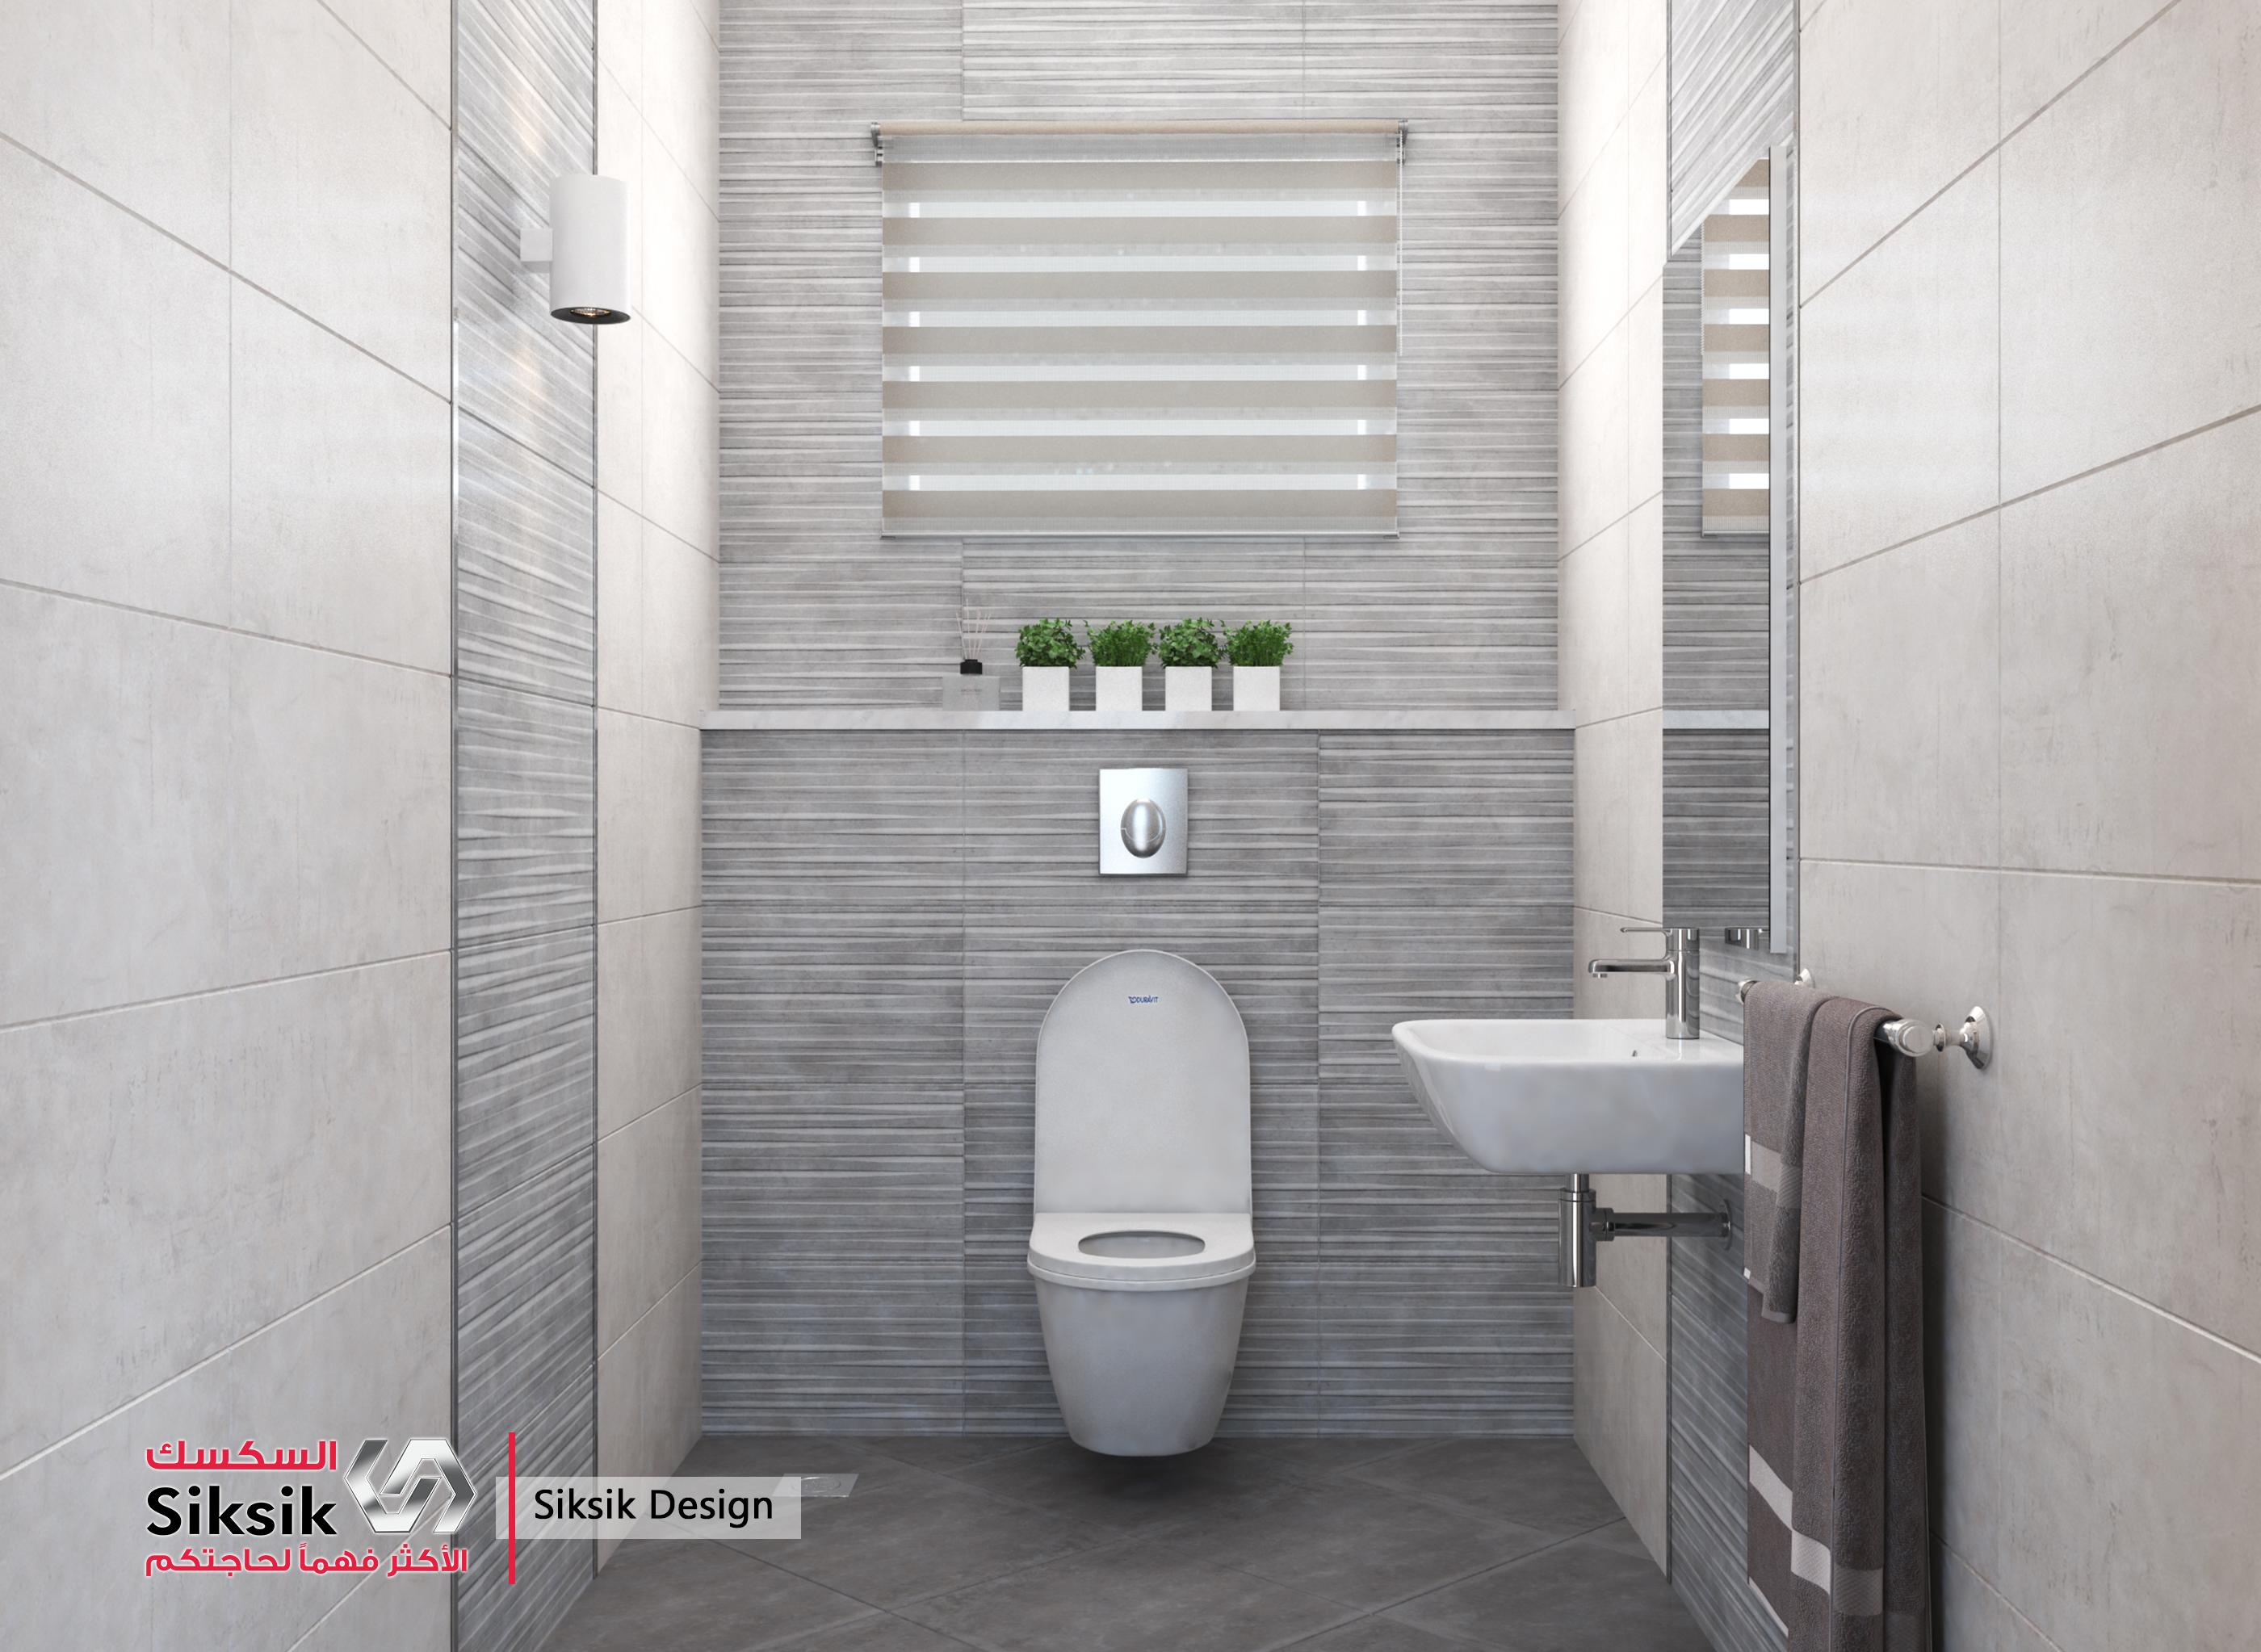 Designs And Models For Bathrooms Bashir Siksik Company Bathroom Design Toilet